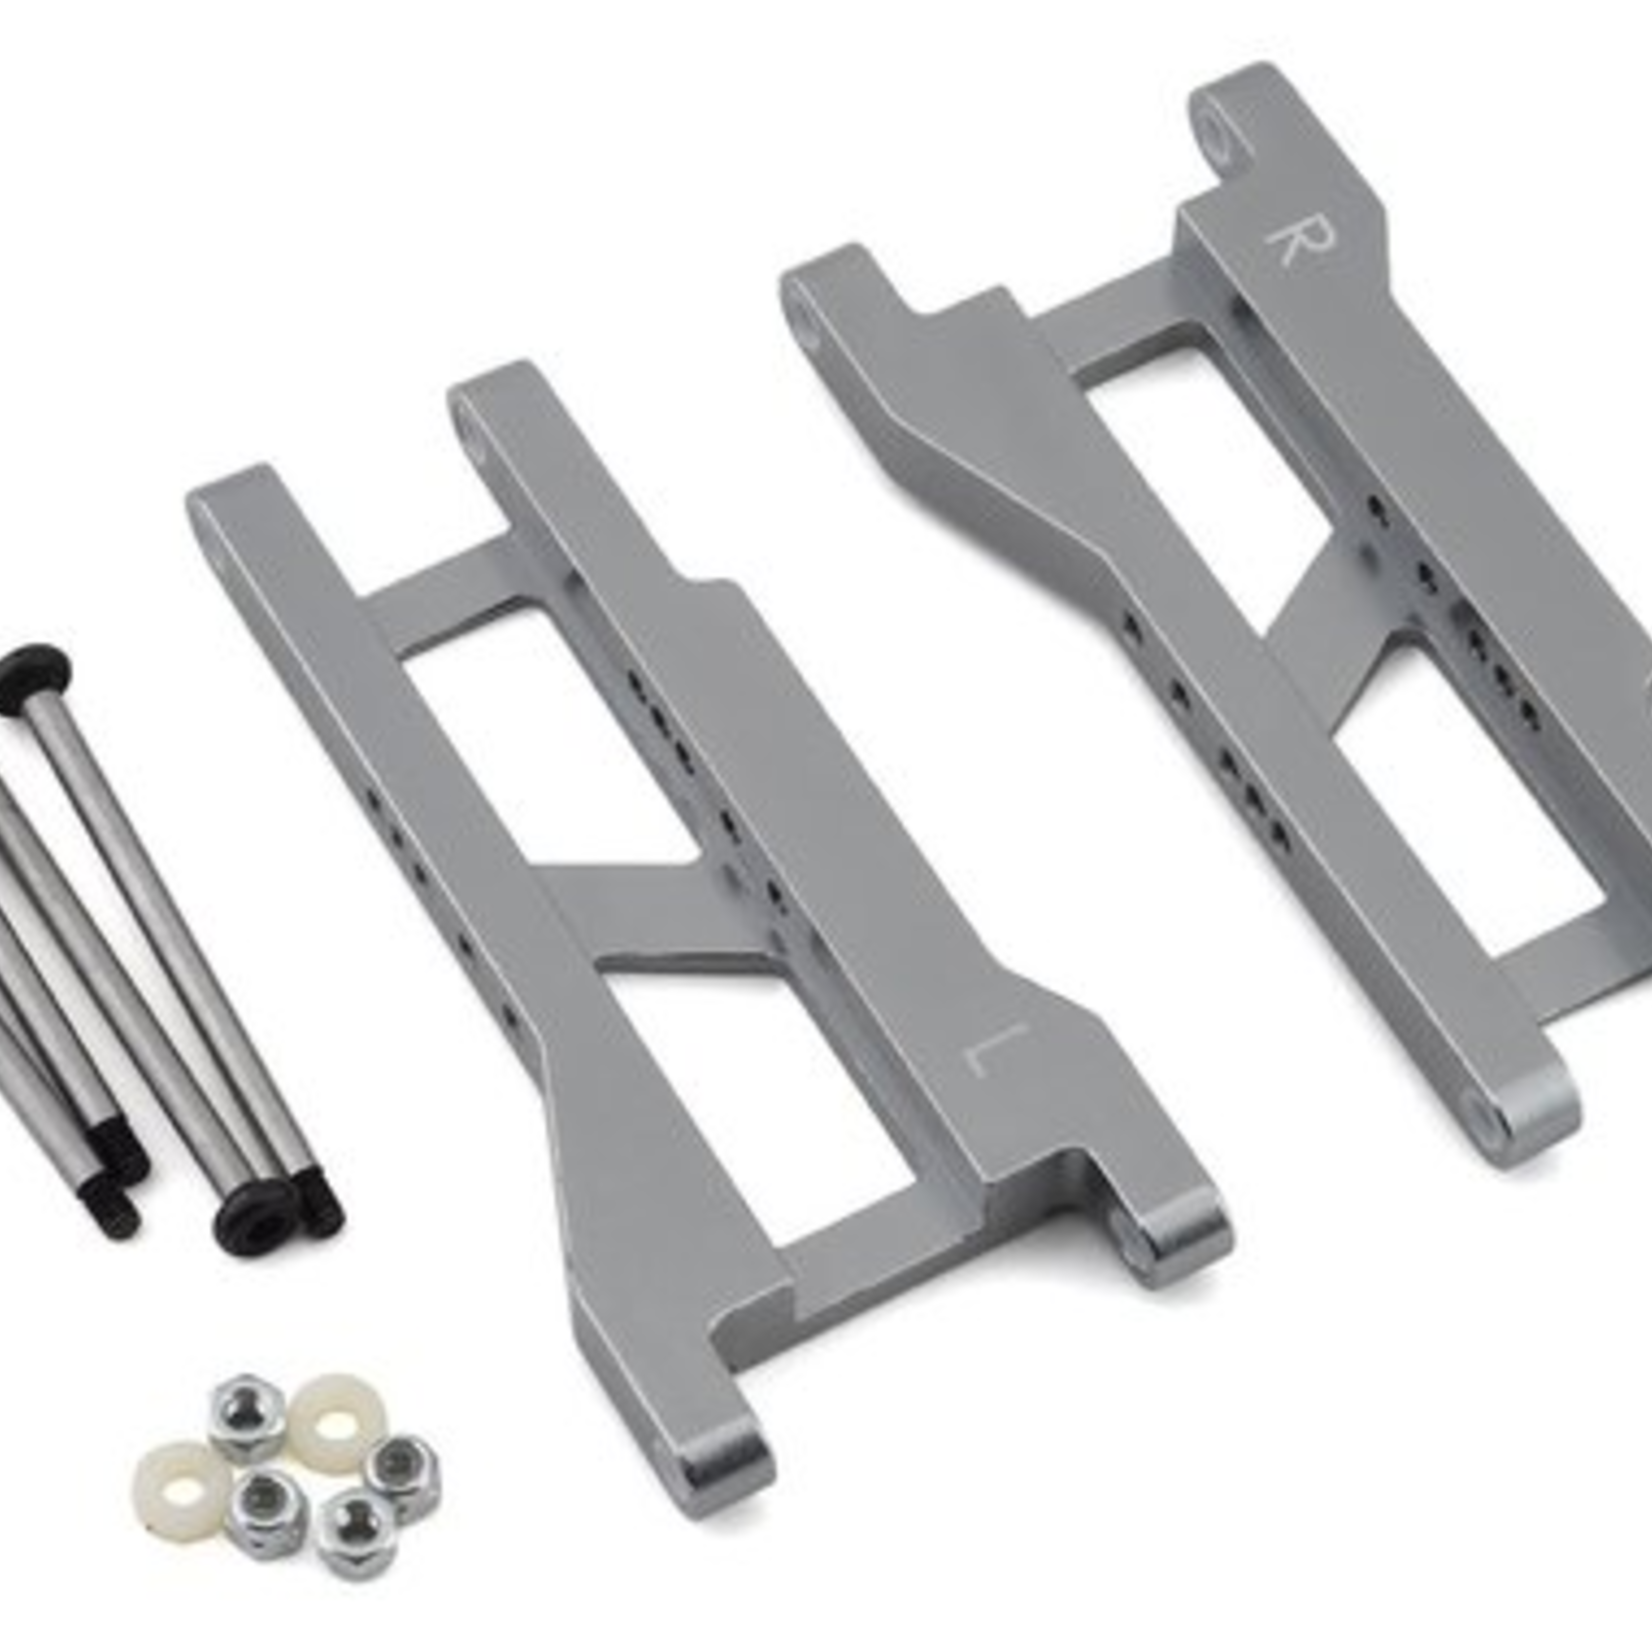 ST Racing Concepts SPTST2555XGM ST Racing Concepts CNC Machined Aluminum Rear A-Arm set (w/steel hinge-pins) for Traxxas Slash (Gun Metal)